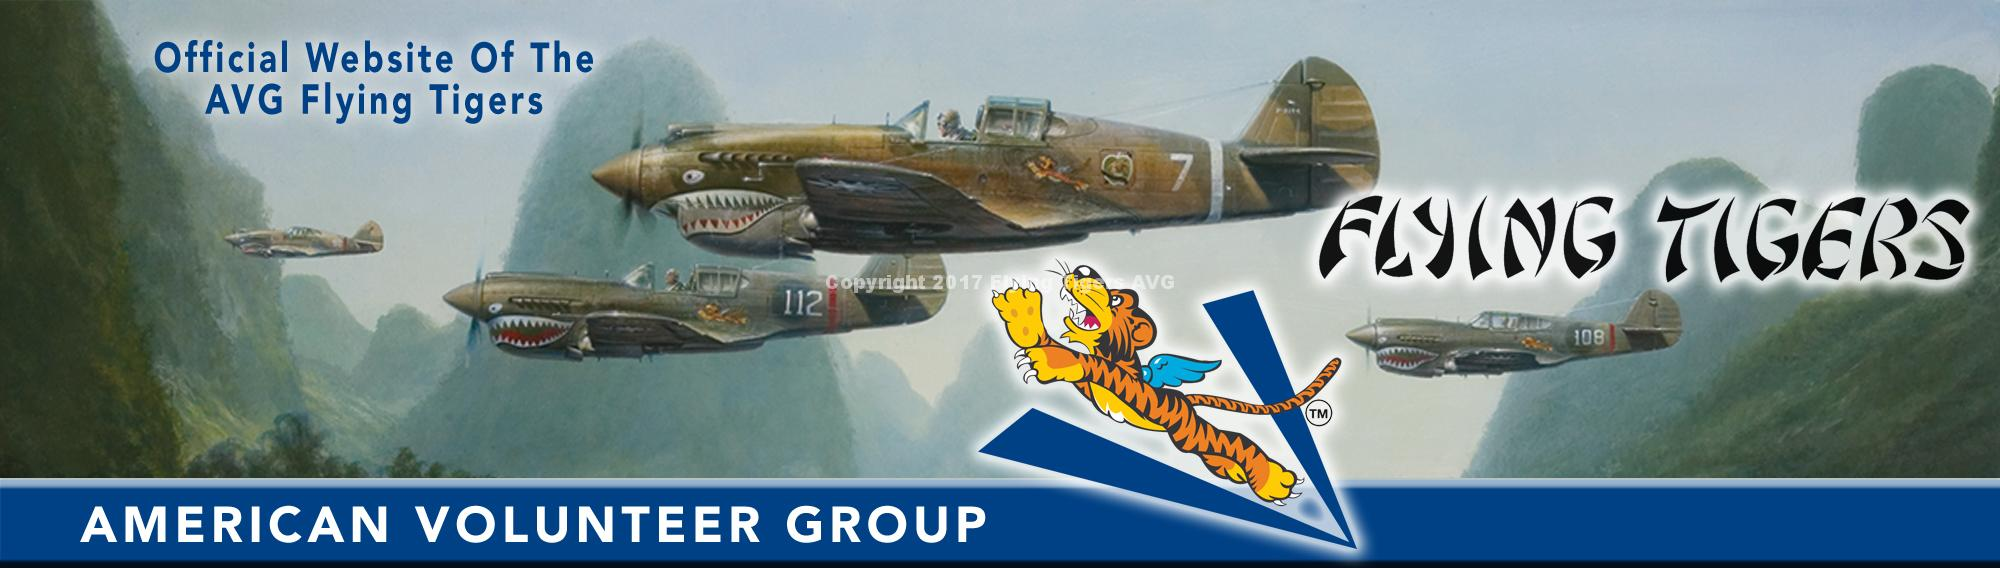 78a9ea94403b AVG Books & Articles | Flying Tigers AVG